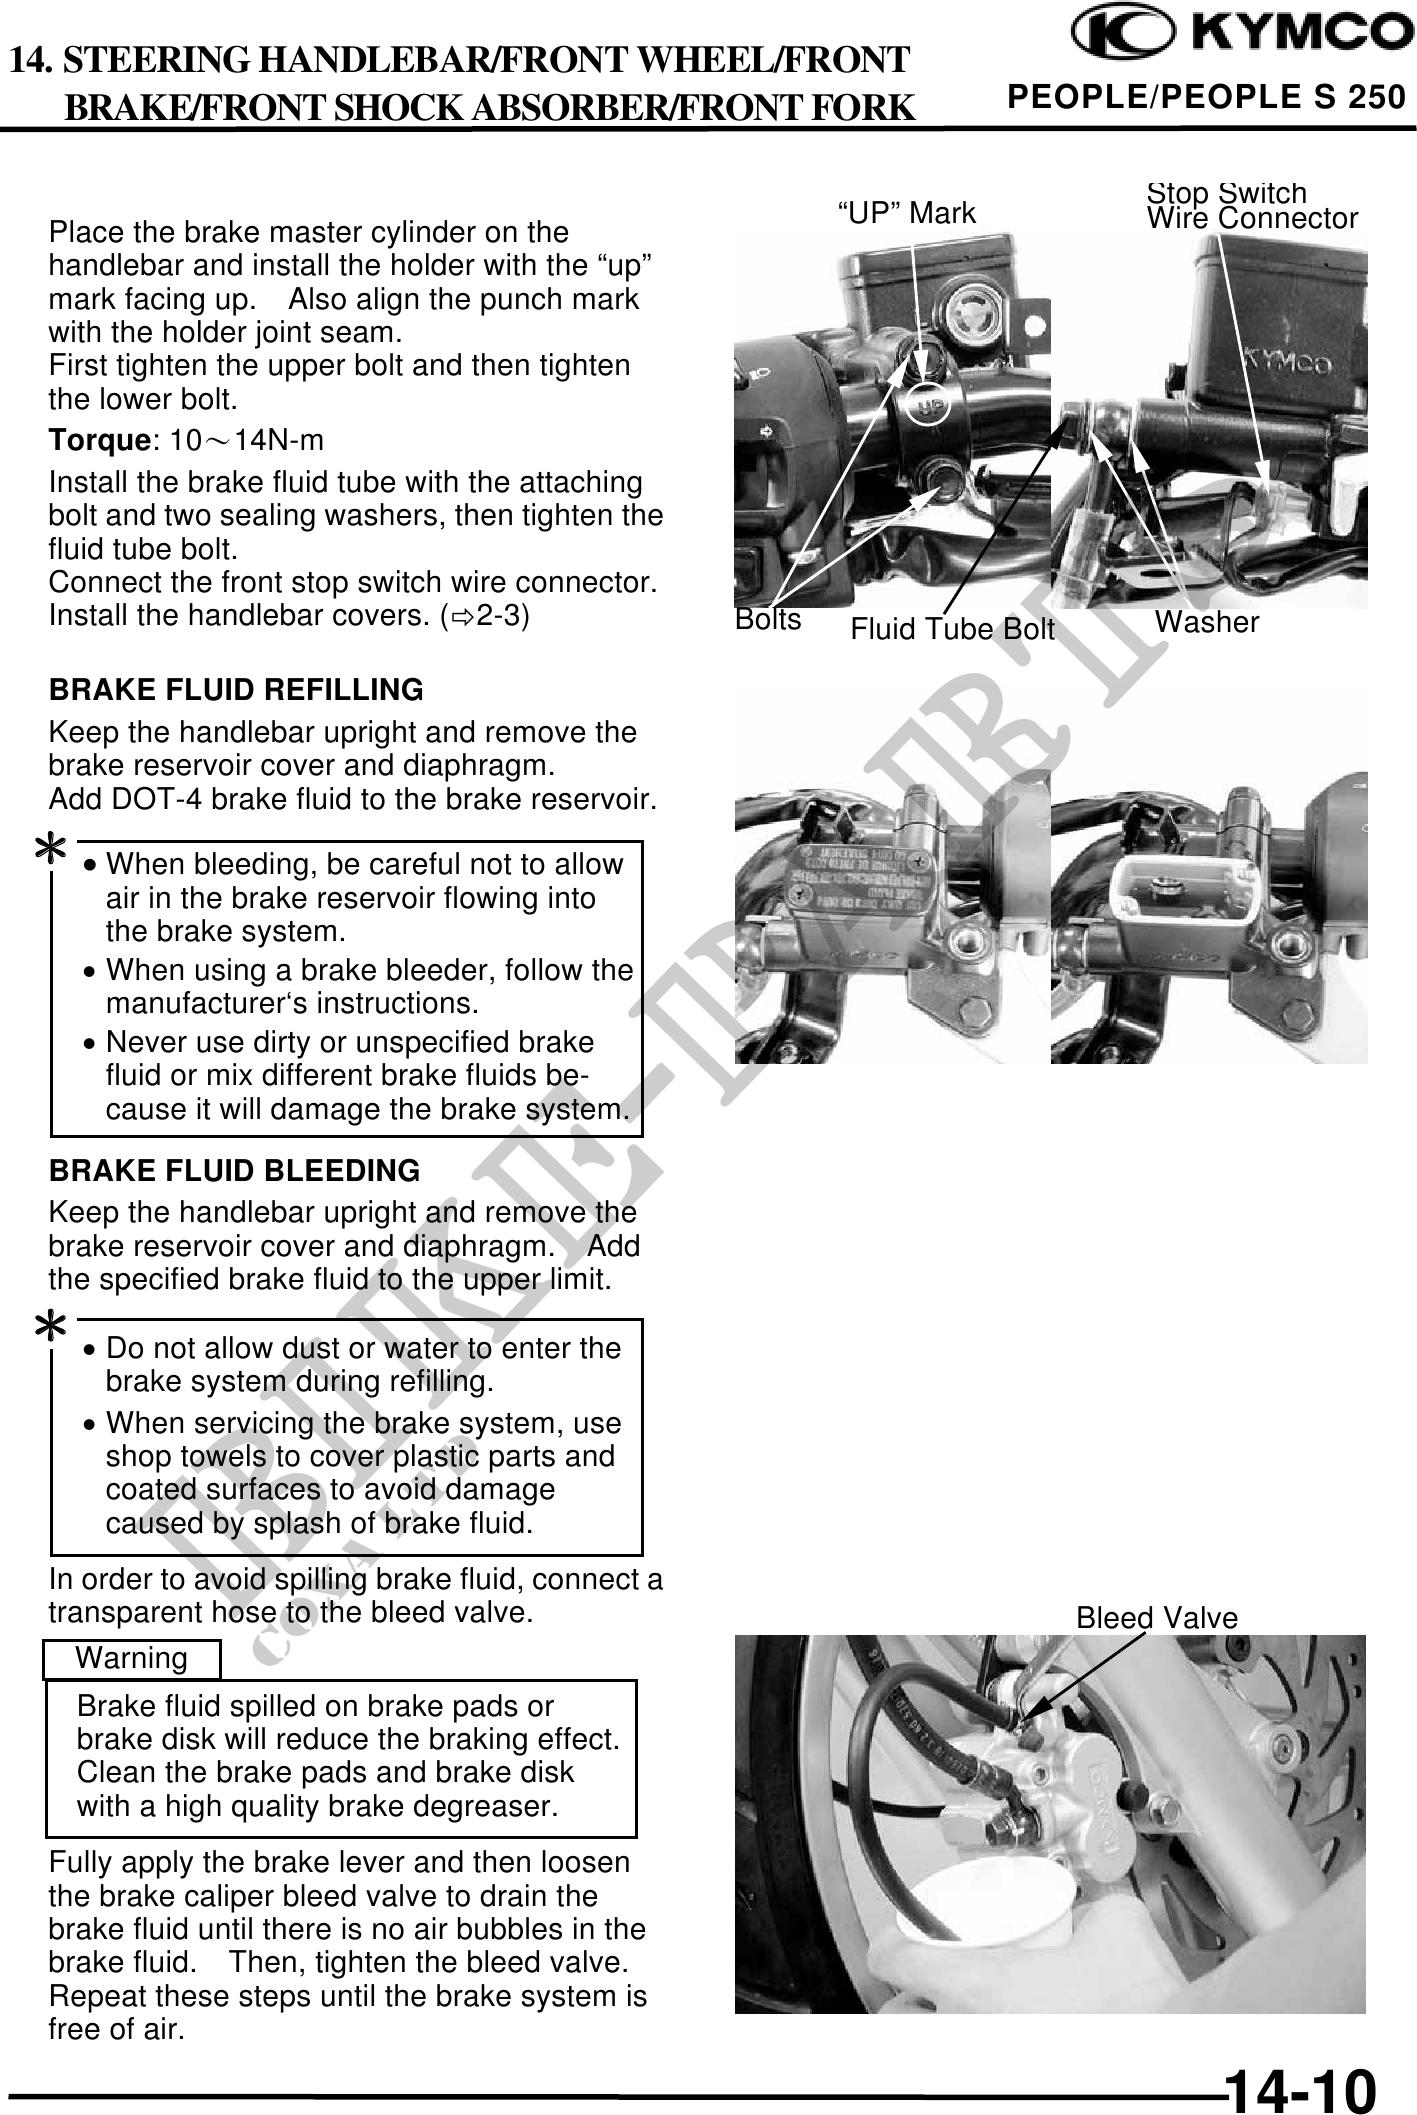 KYMCO - Catalogo Online di Ricambi Originali